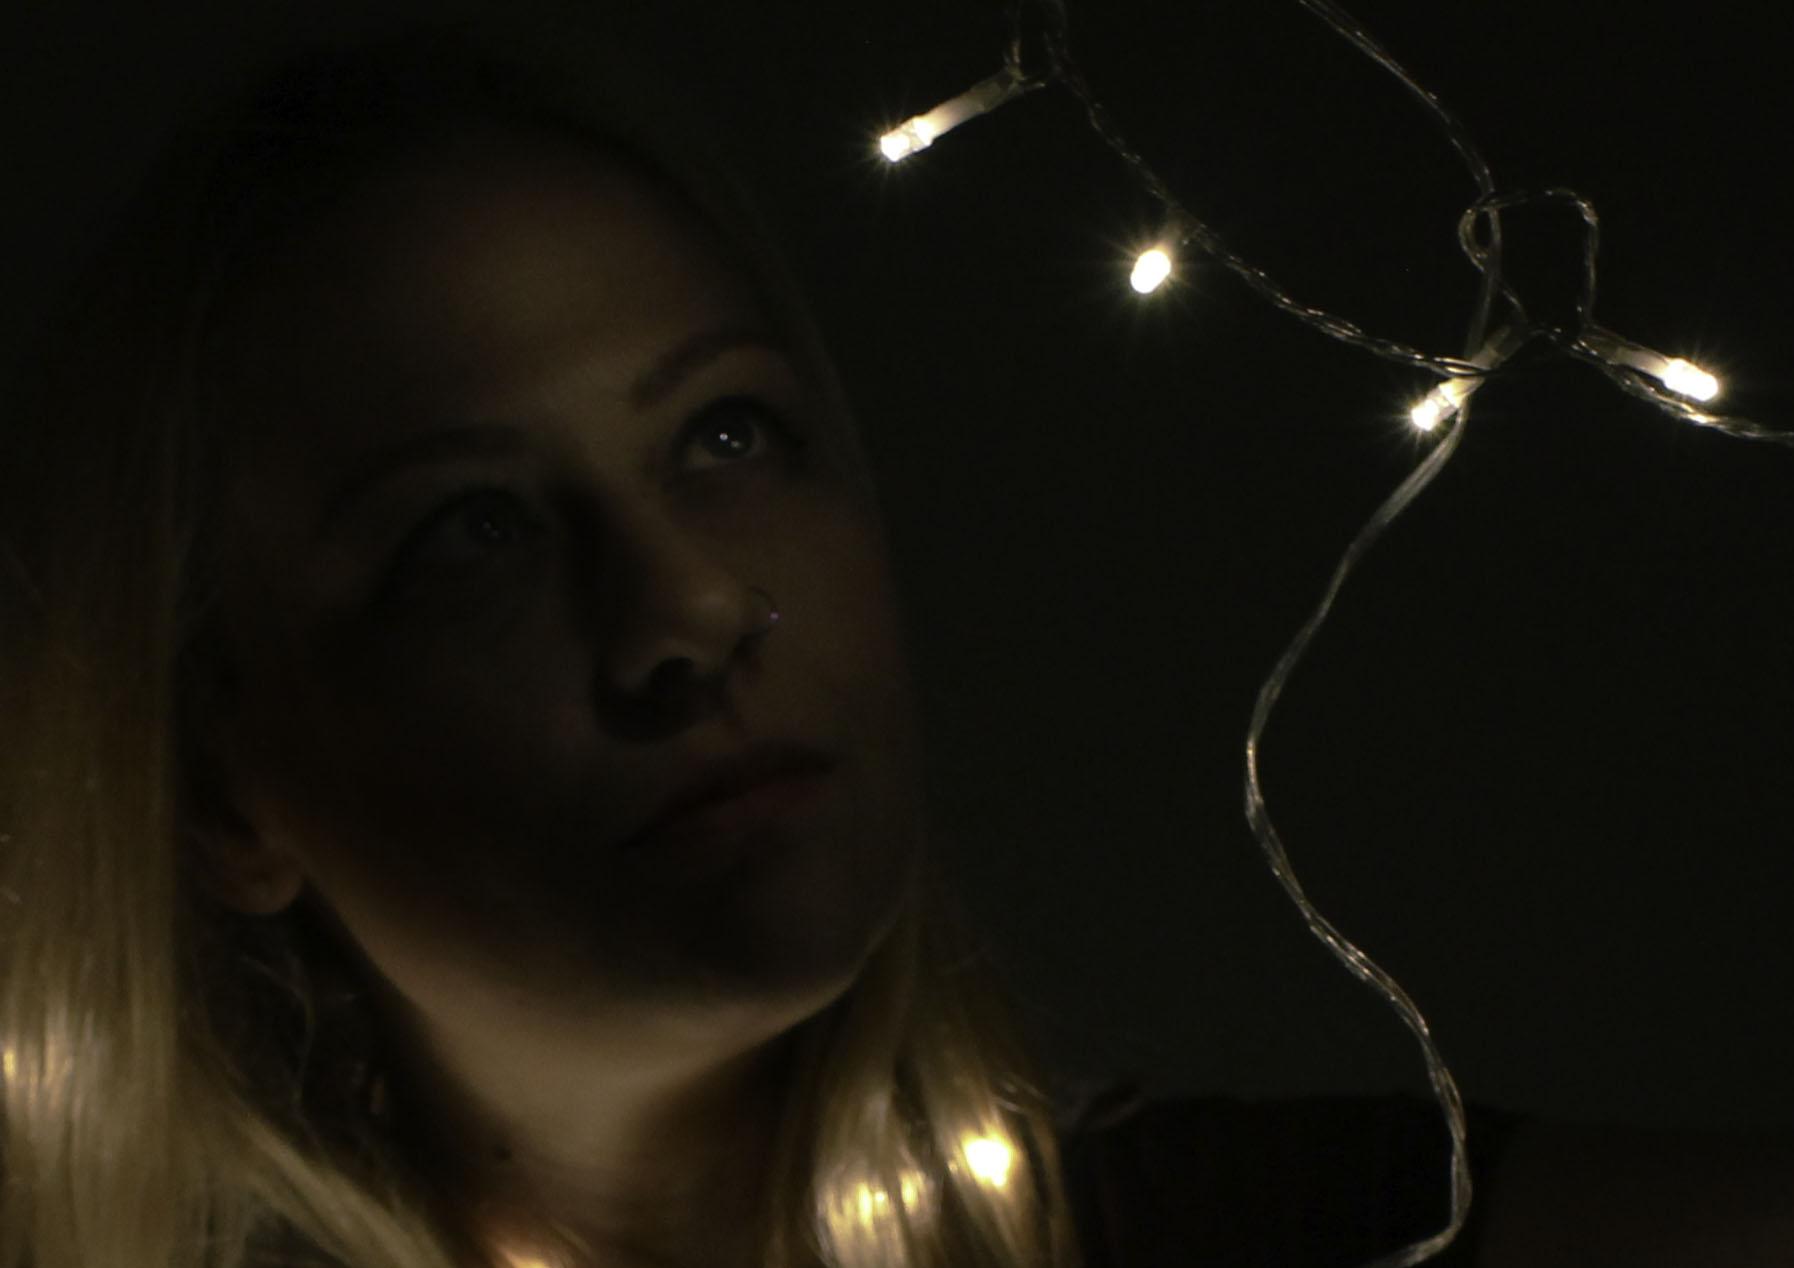 Fairy Light series